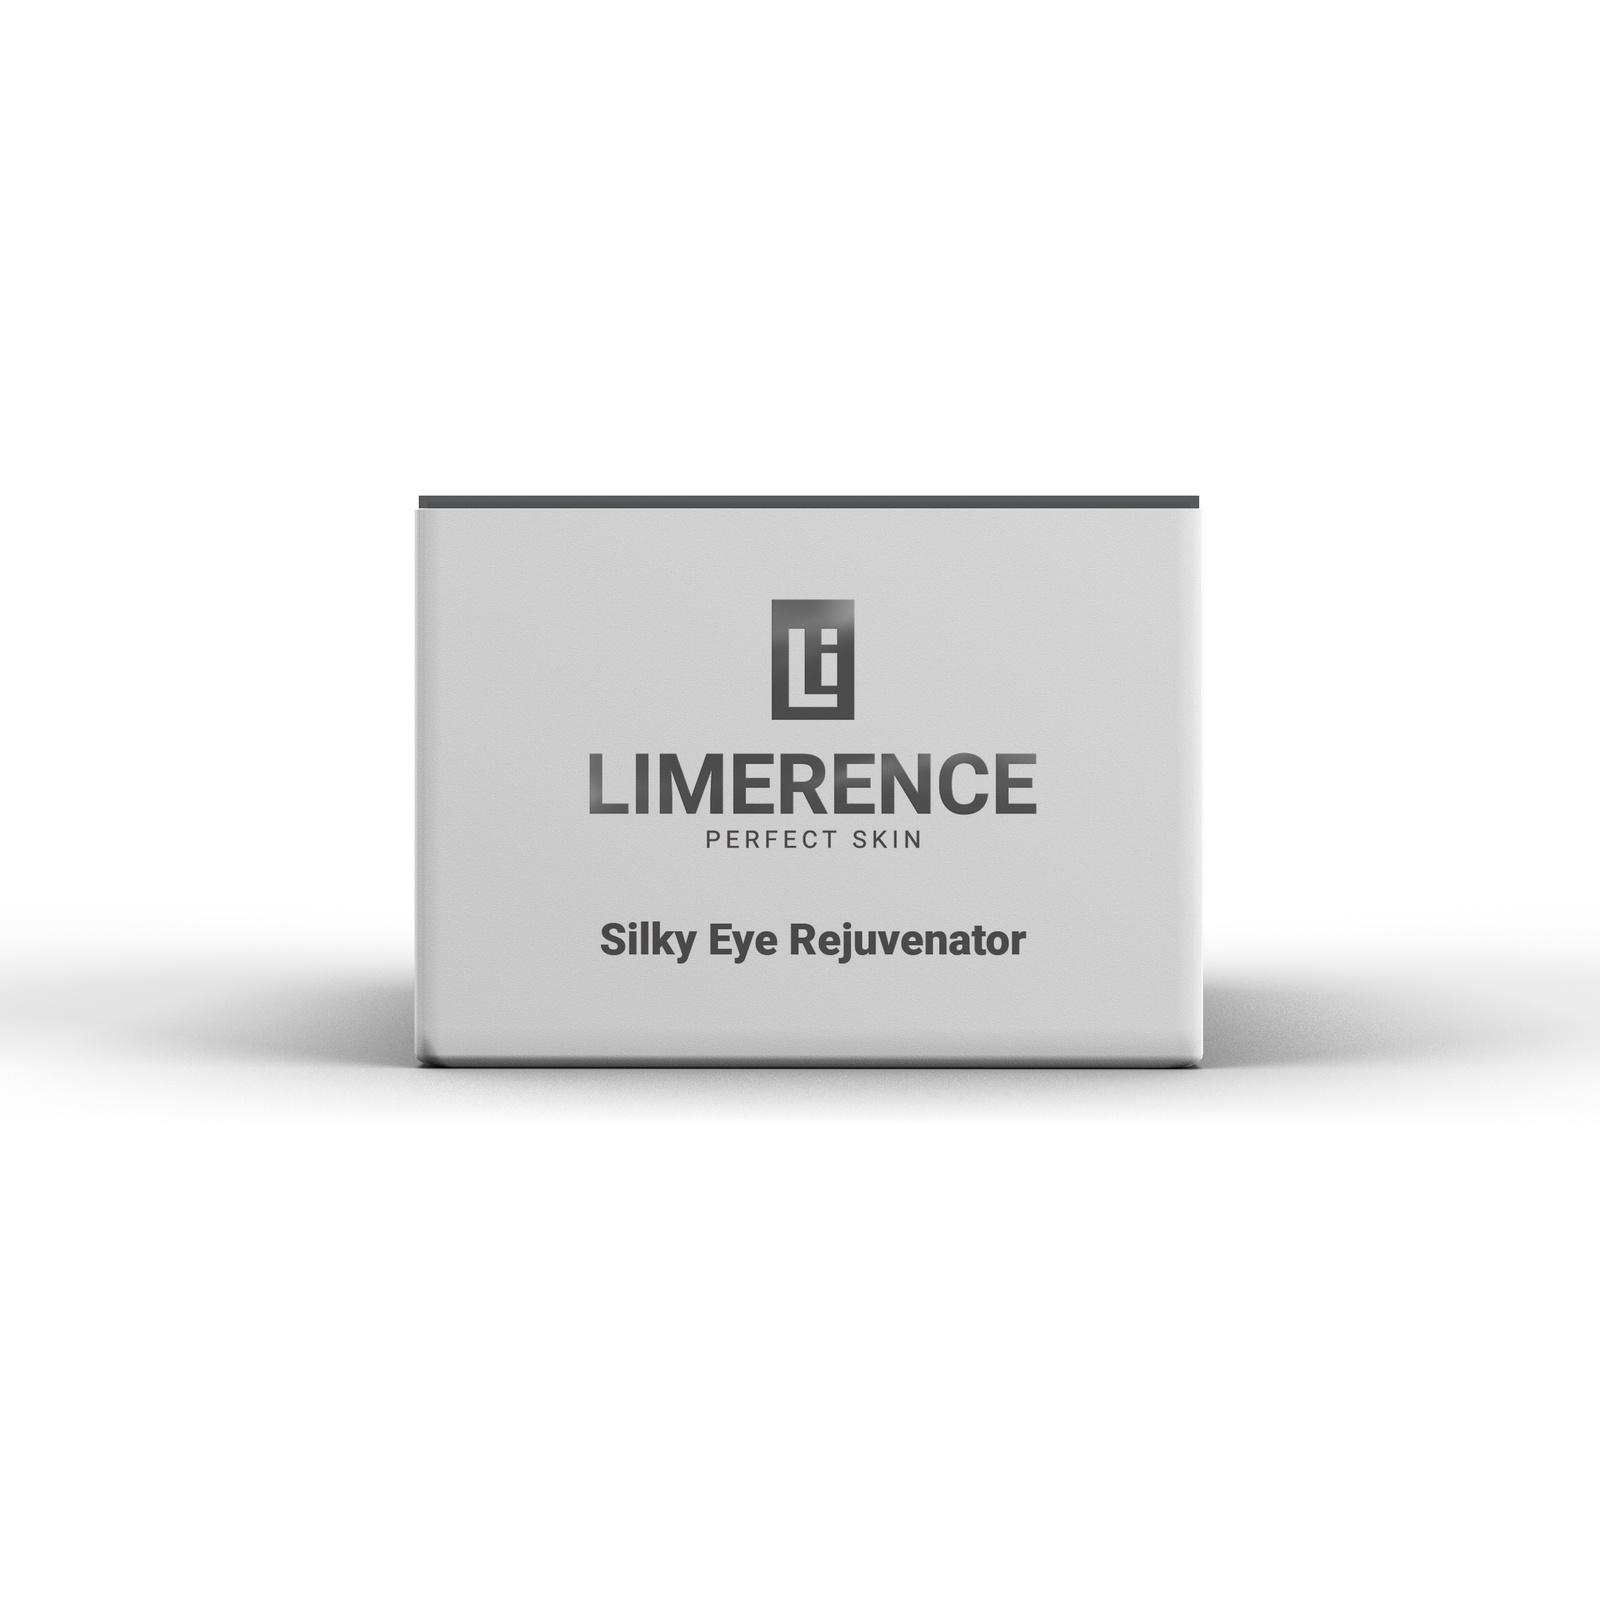 LimerenceКрем для зоны вокруг глаз Silky Eye Rejuvenator, 15 мл Limerence